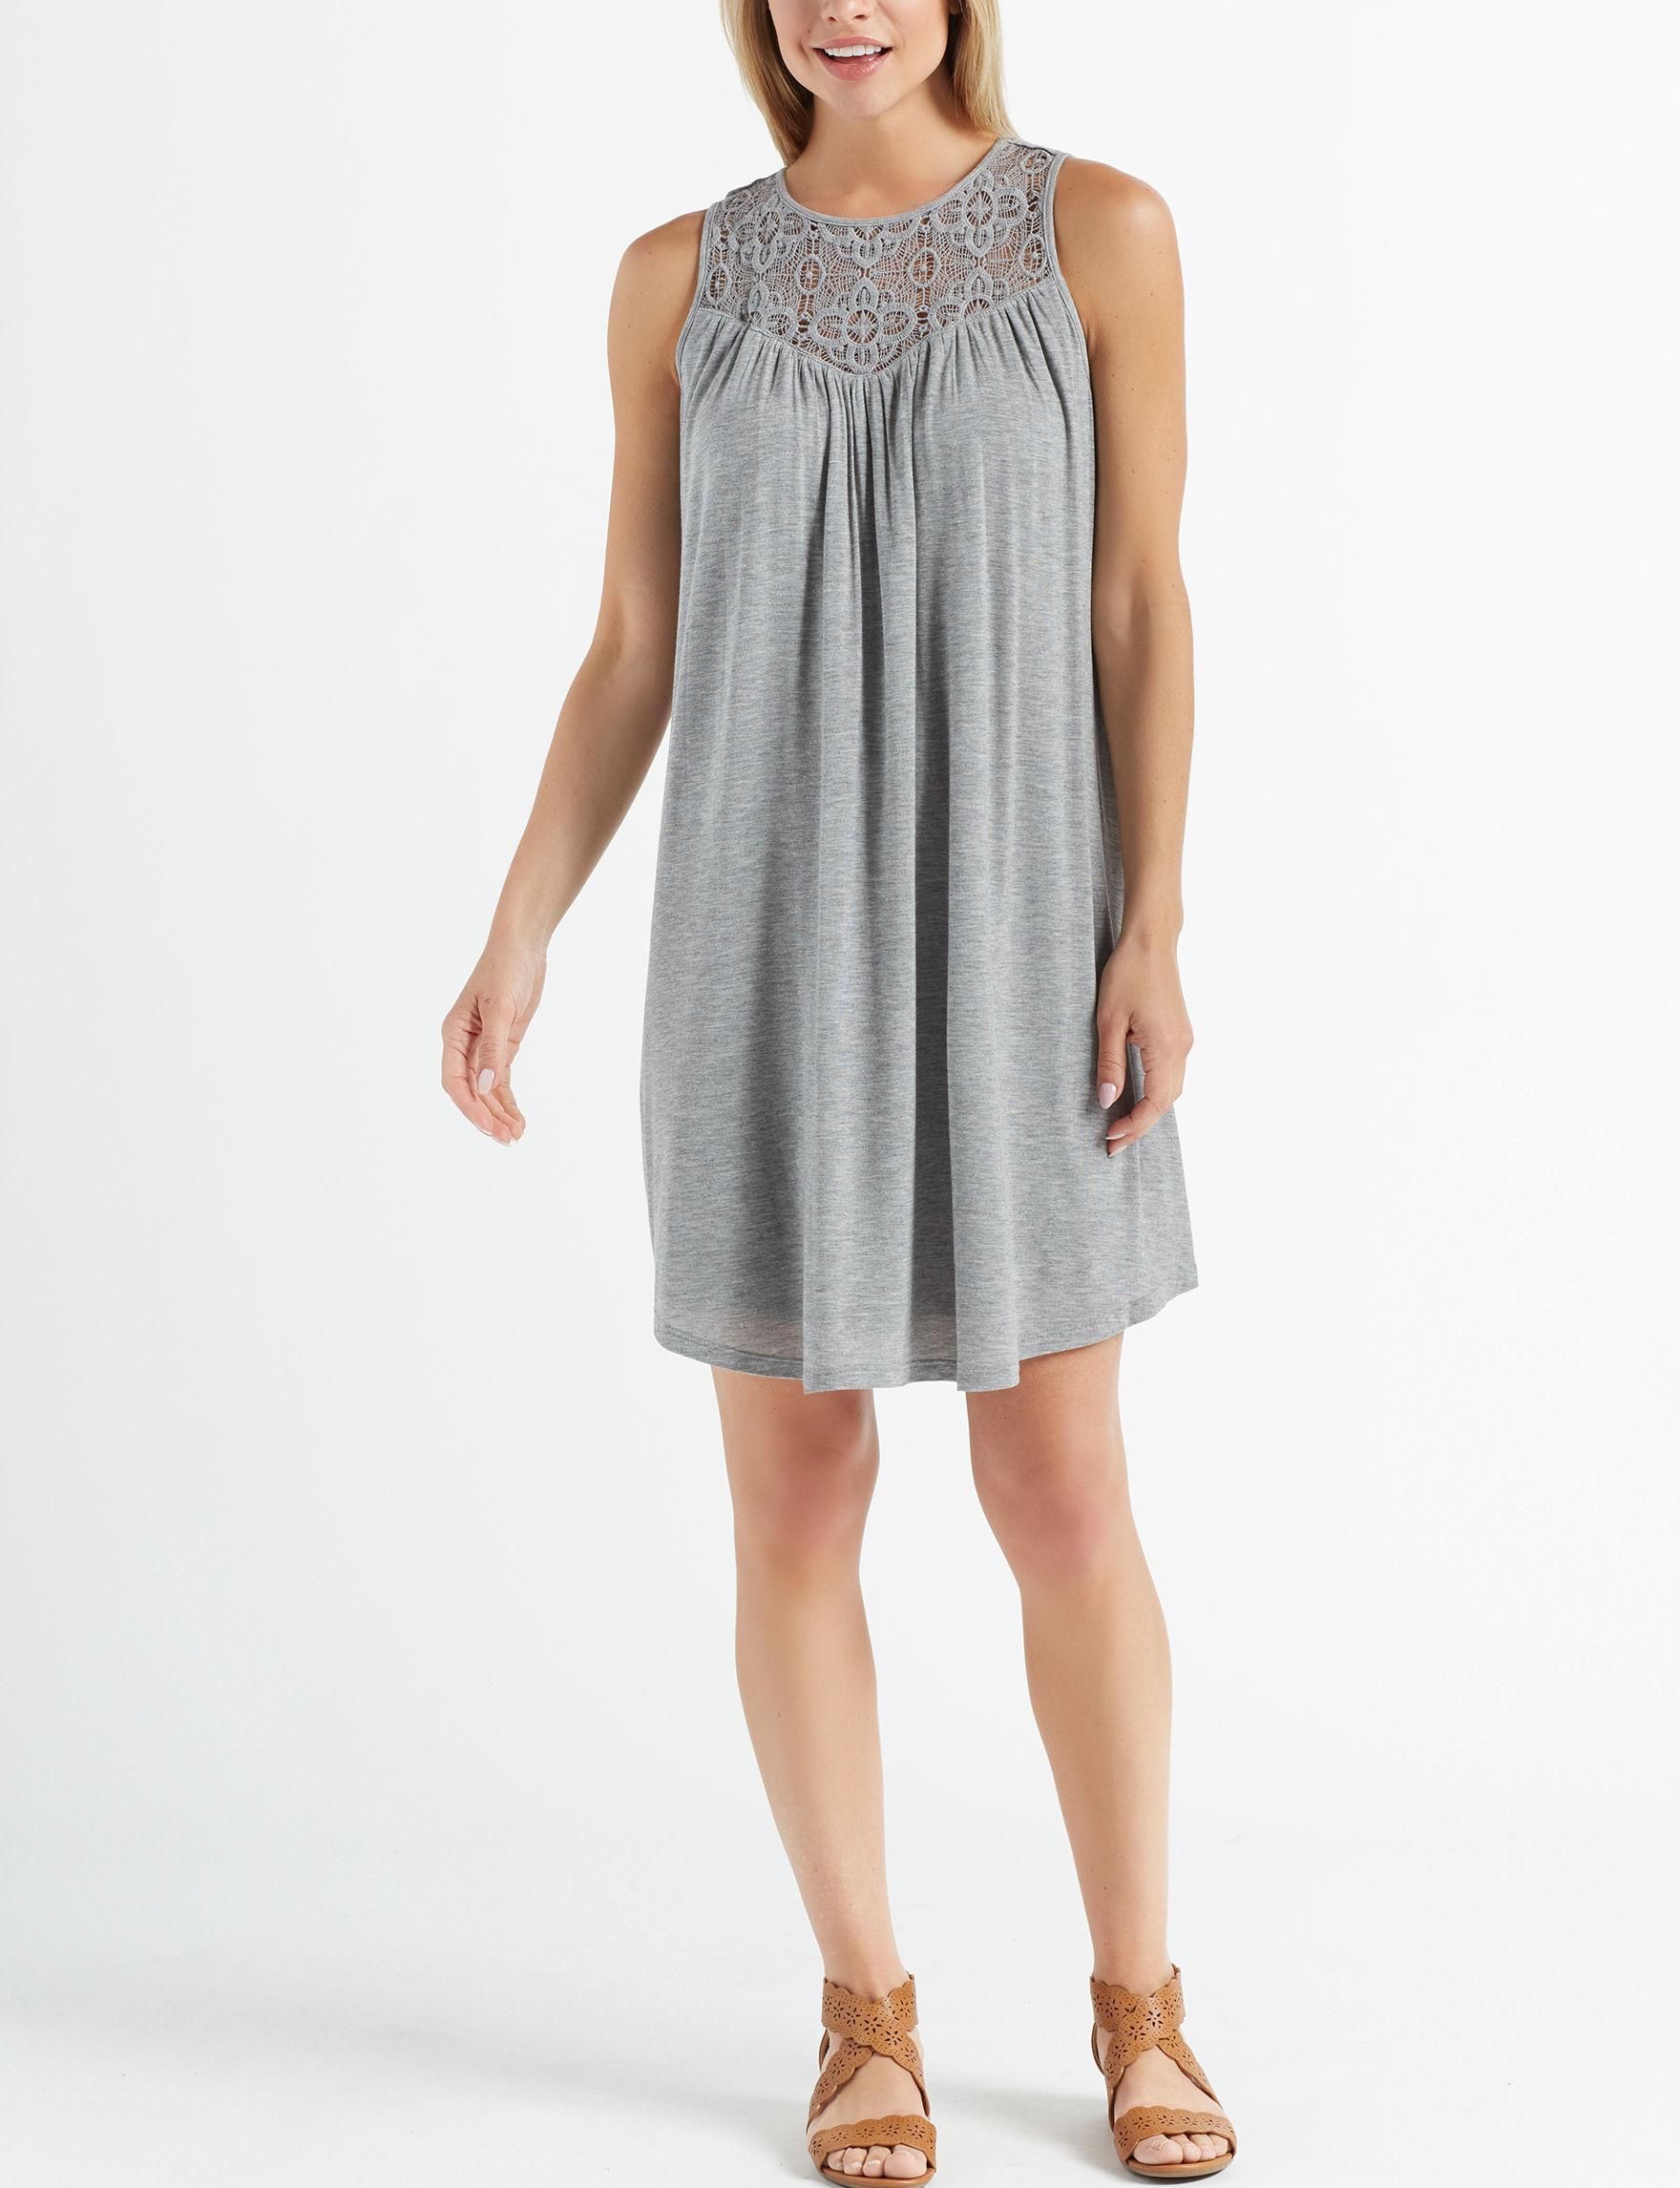 Nina Leonard Light Grey Everyday & Casual Shift Dresses